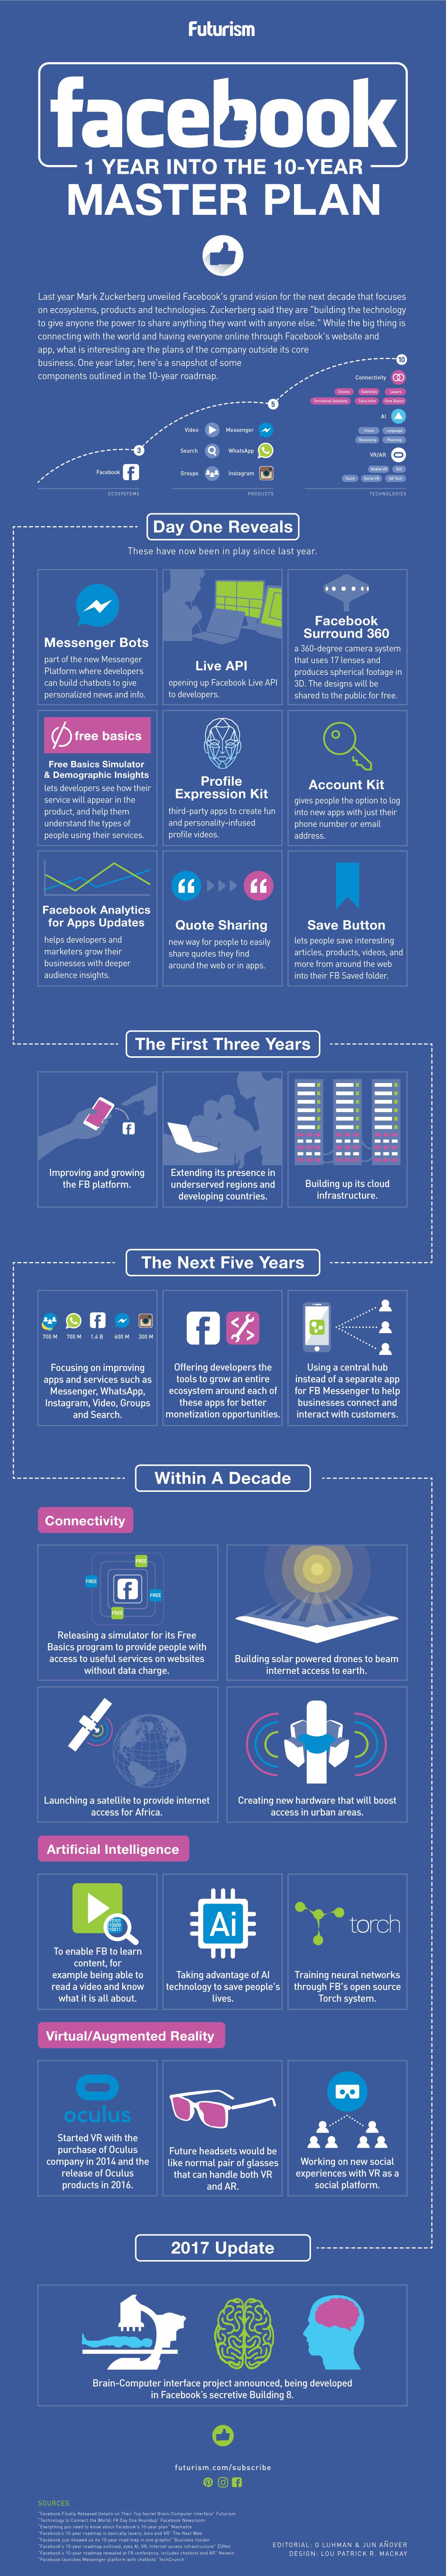 Infographic: Facebook's Ten Year Plan 1